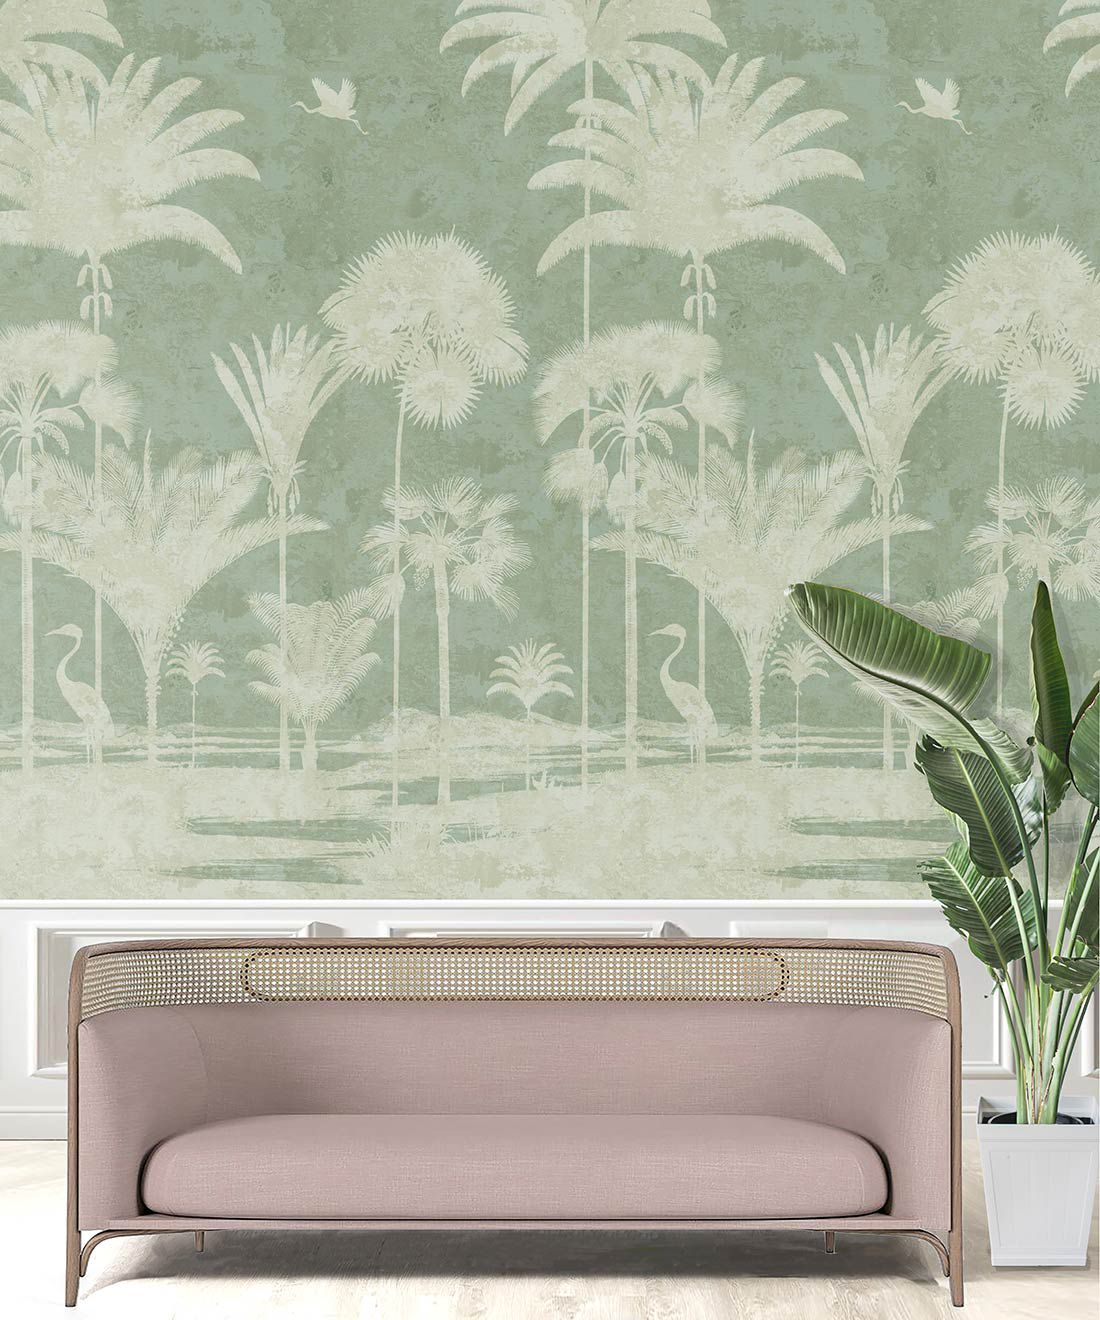 Shadow Palms Wallpaper Mural •Bethany Linz • Palm Tree Mural • Mint • Insitu